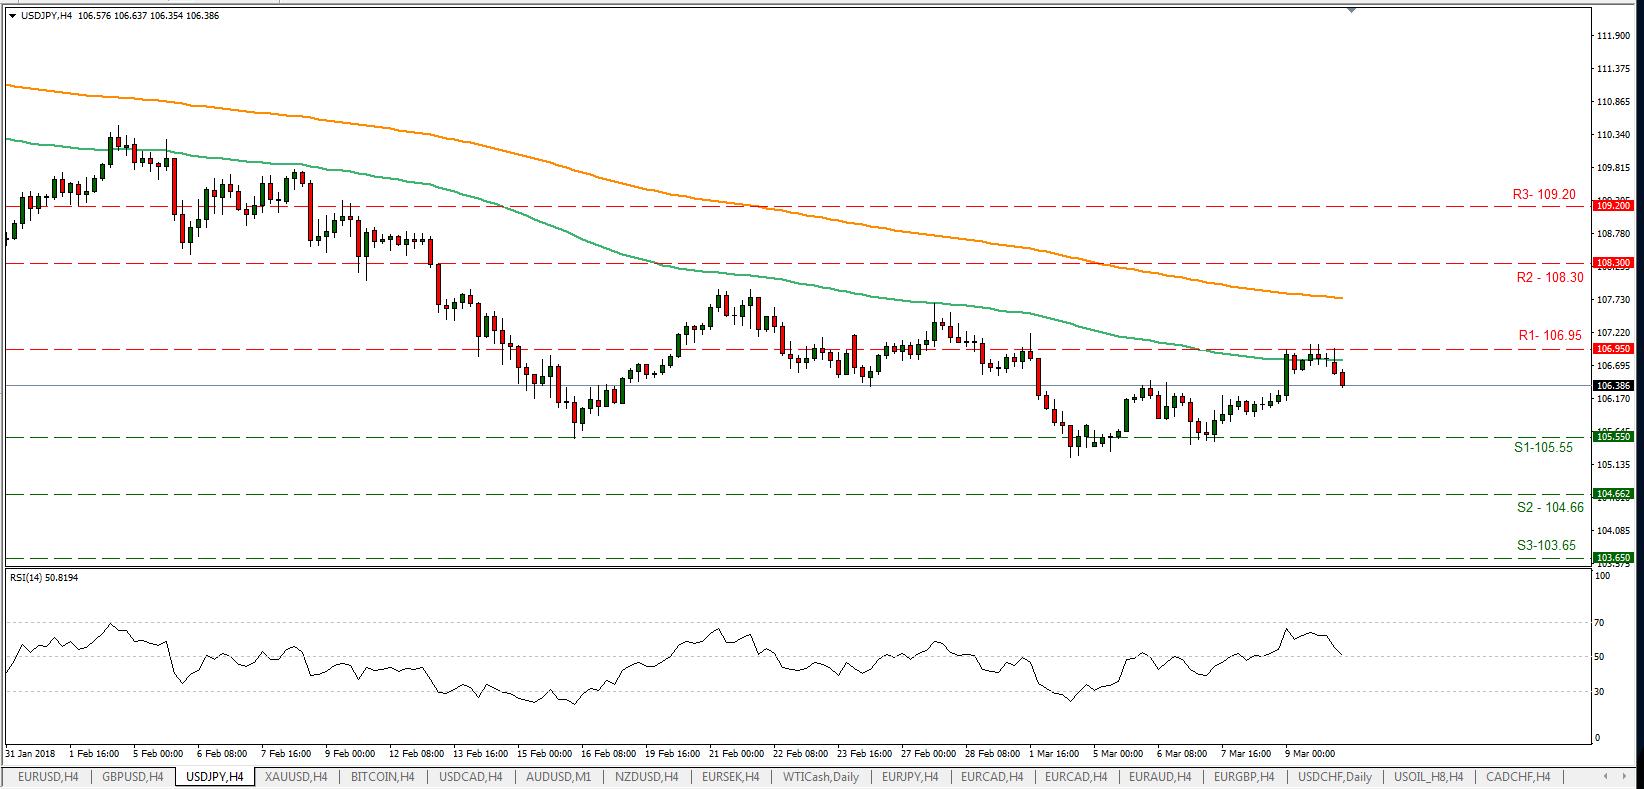 USD/JPY 12/03/2018 | EconAlerts